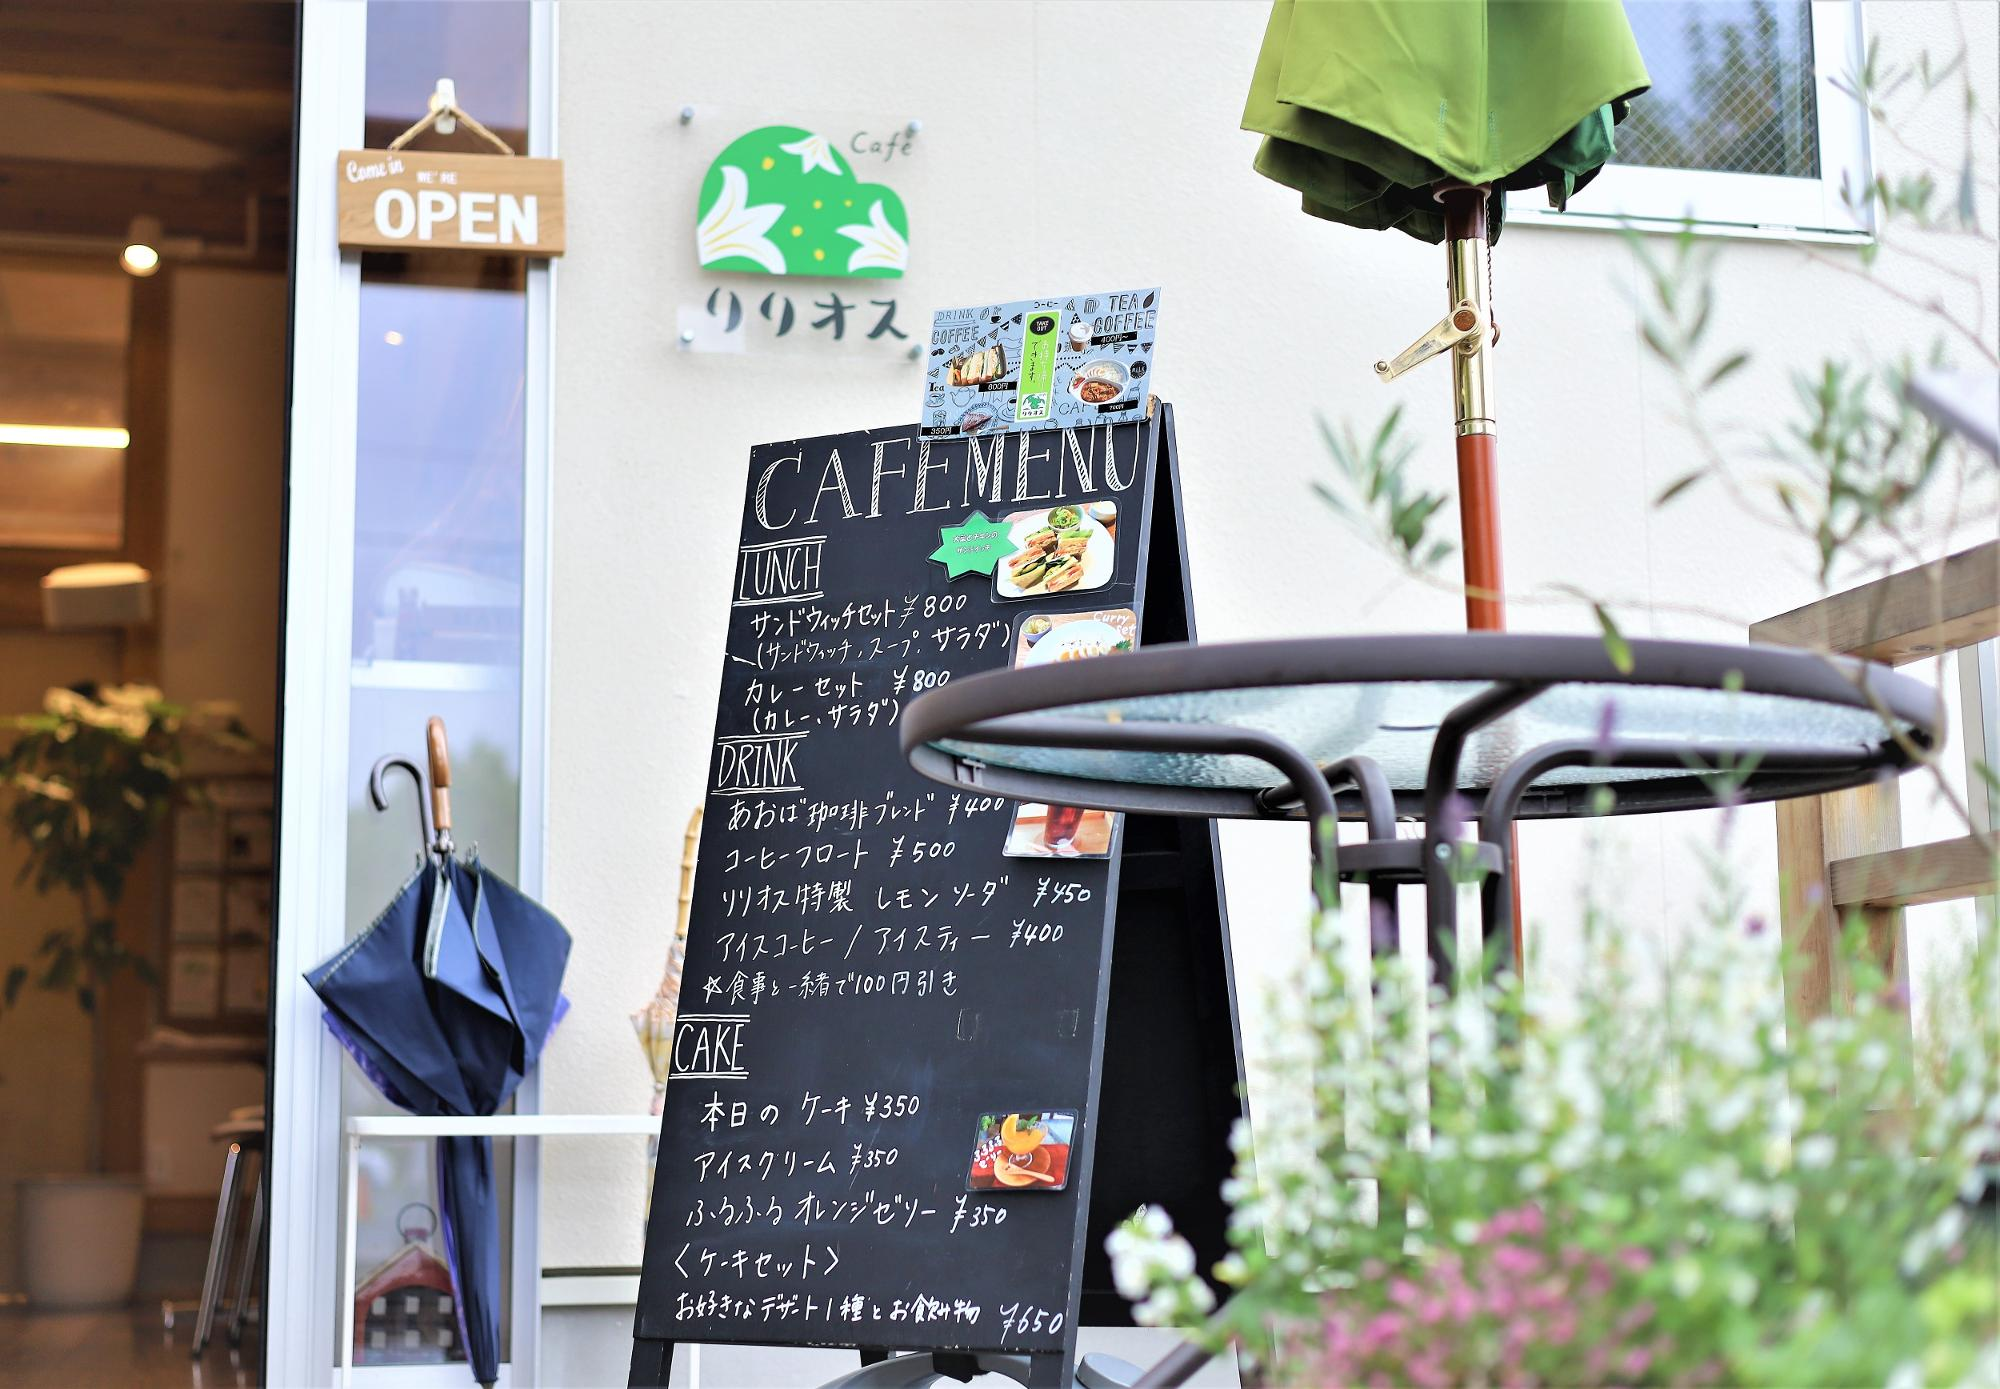 Cafeが併設されたしんゆり交流空間リリオスにて編集作業。